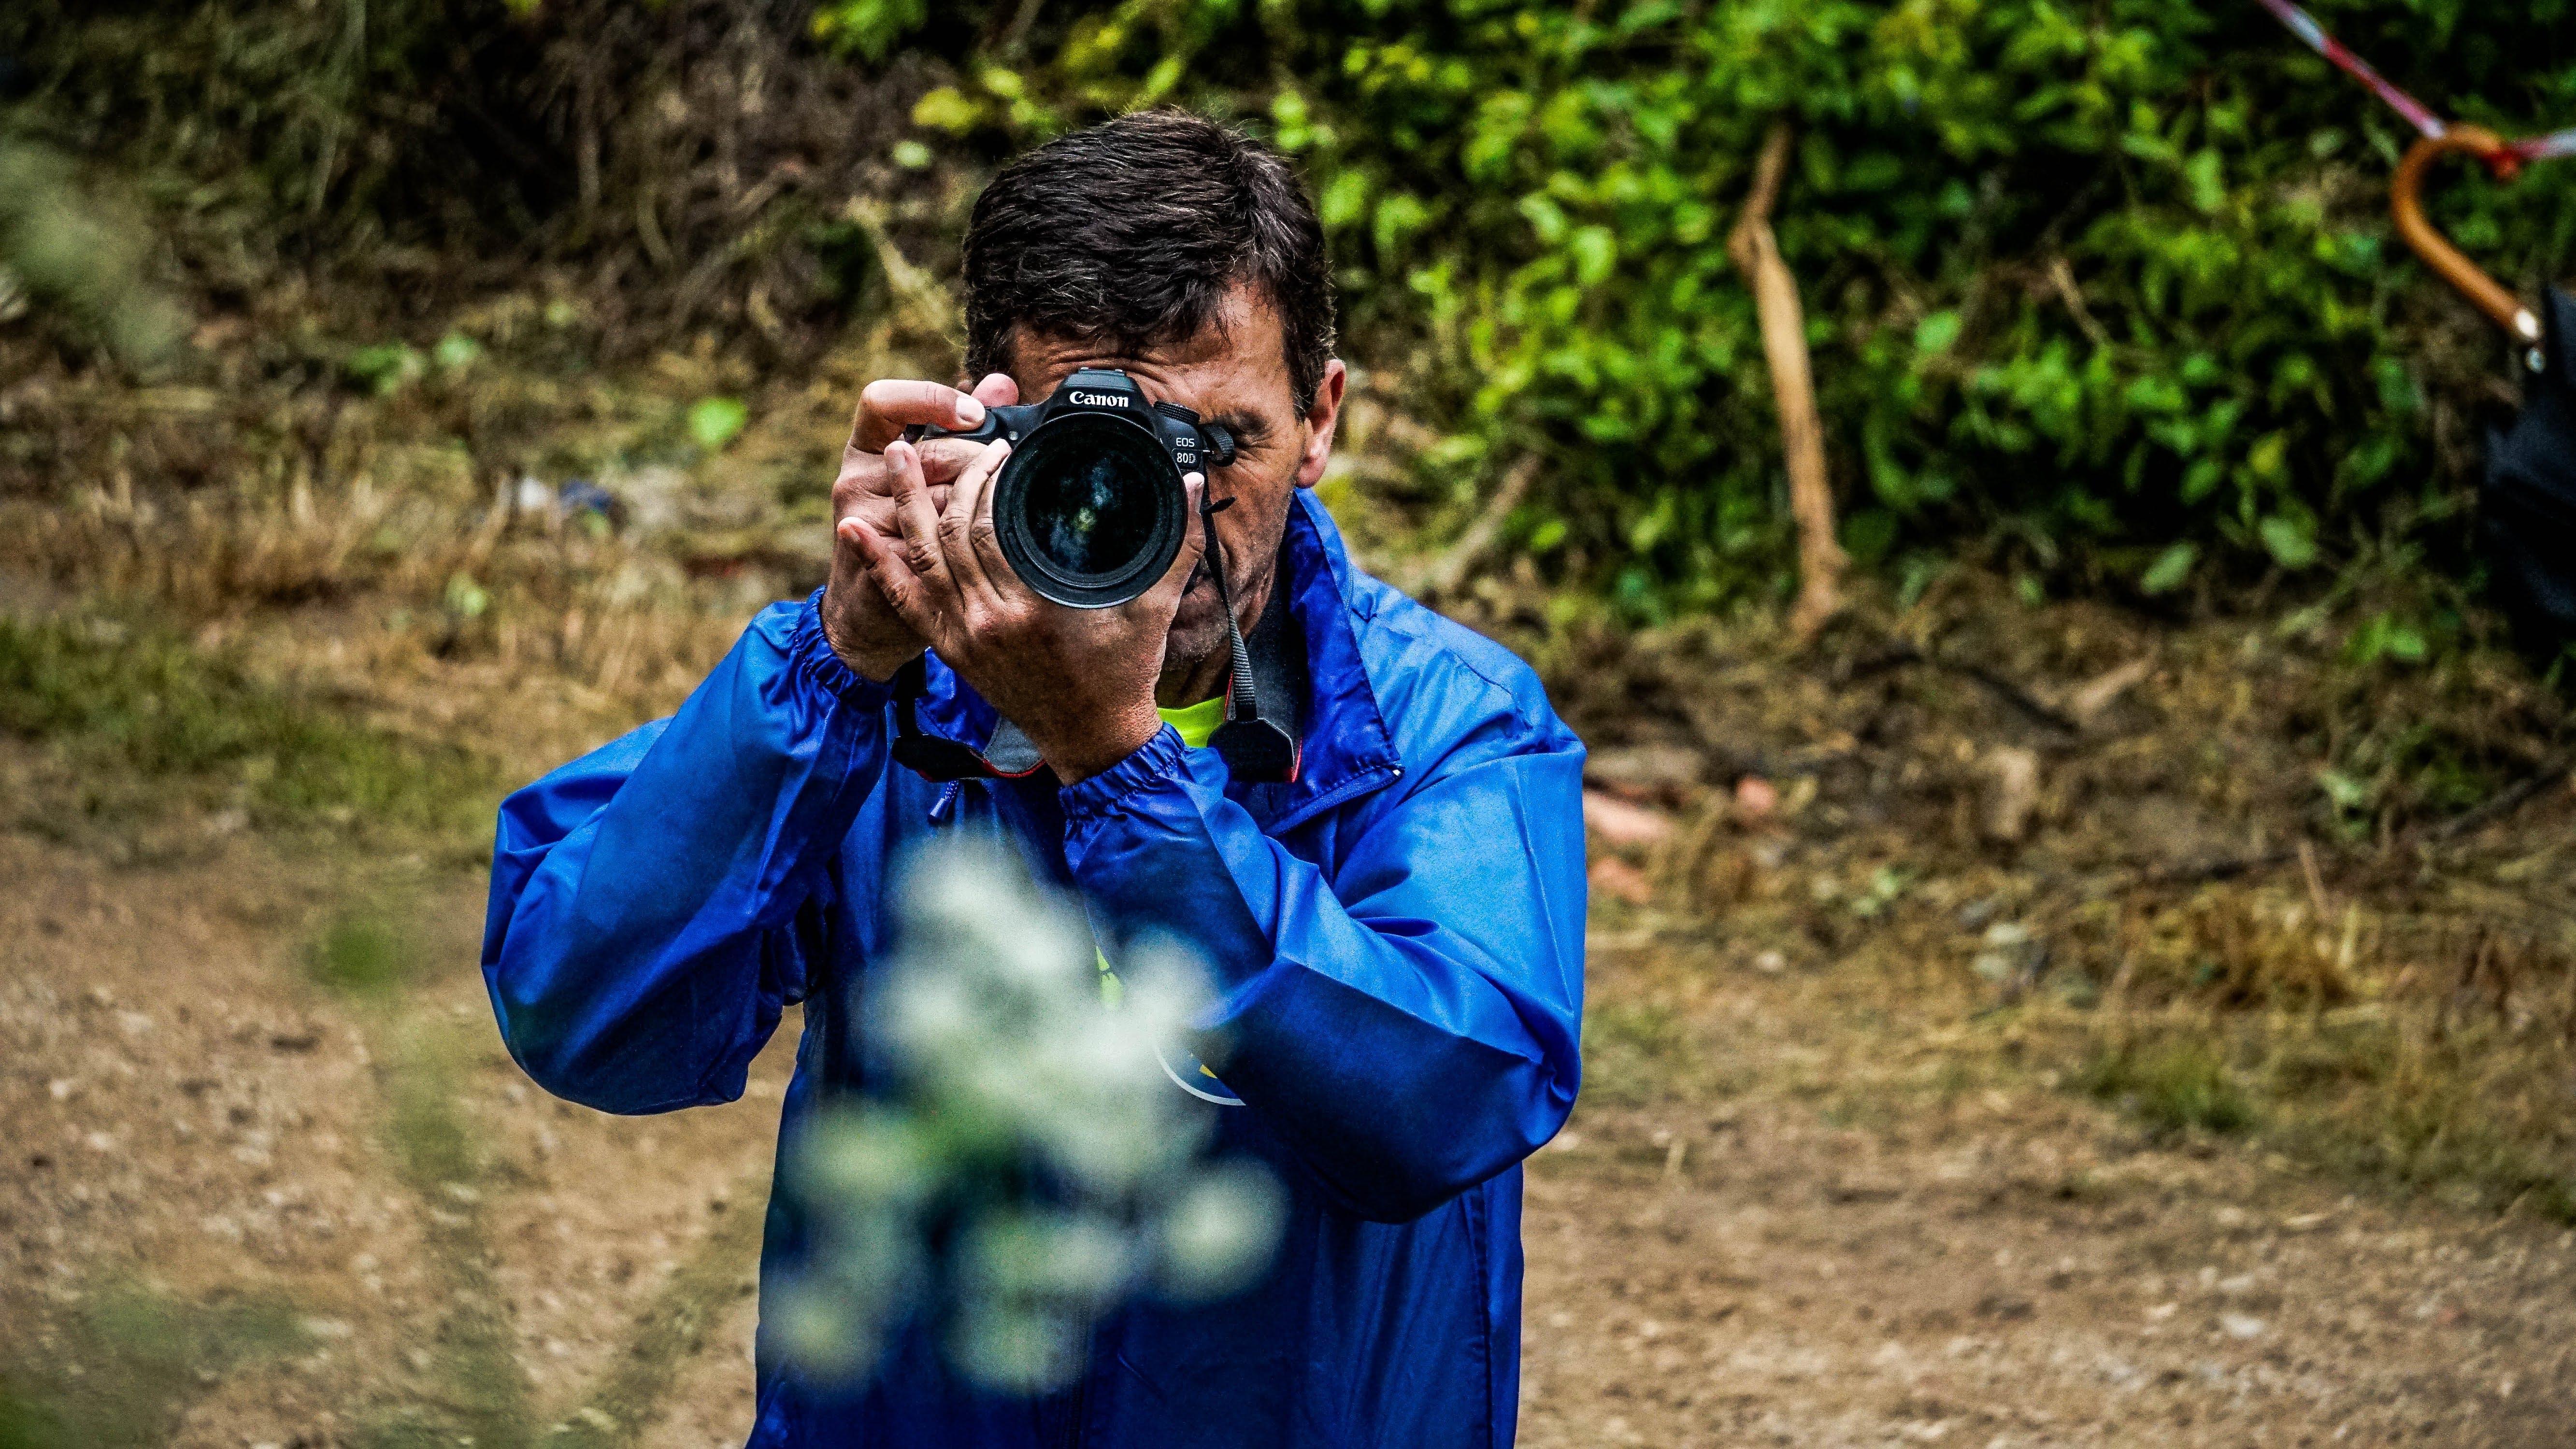 Man Taking Photo Near Woods